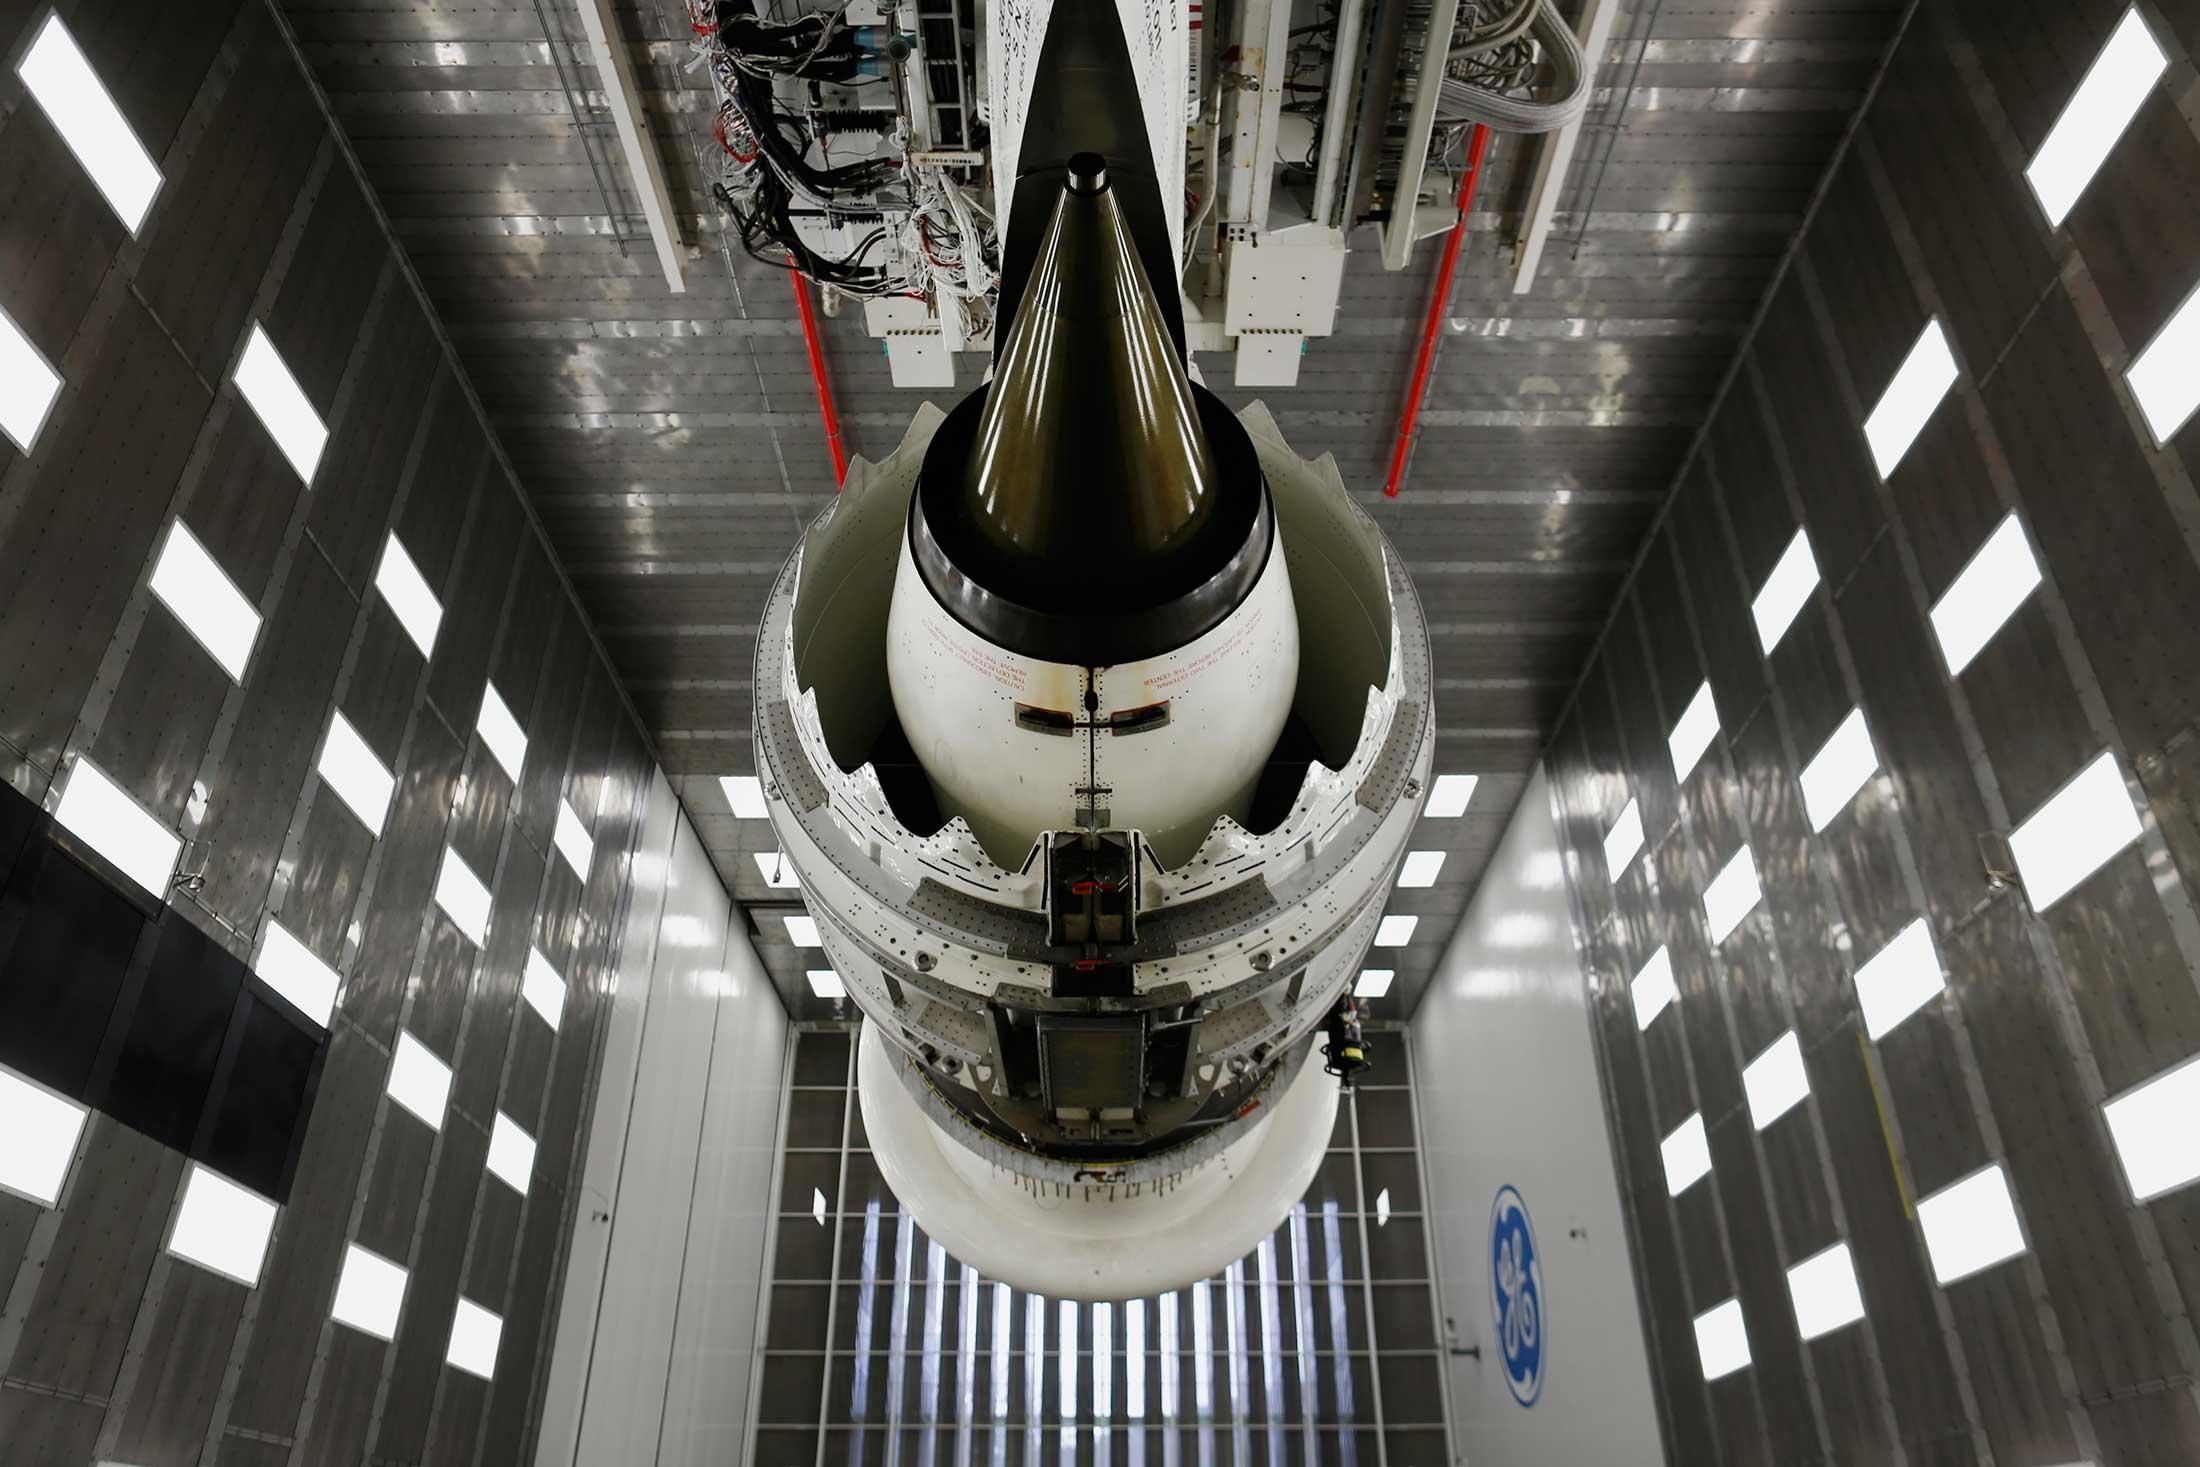 GE Plans $200 Million Rocket City Plants on Jet Engine Surge